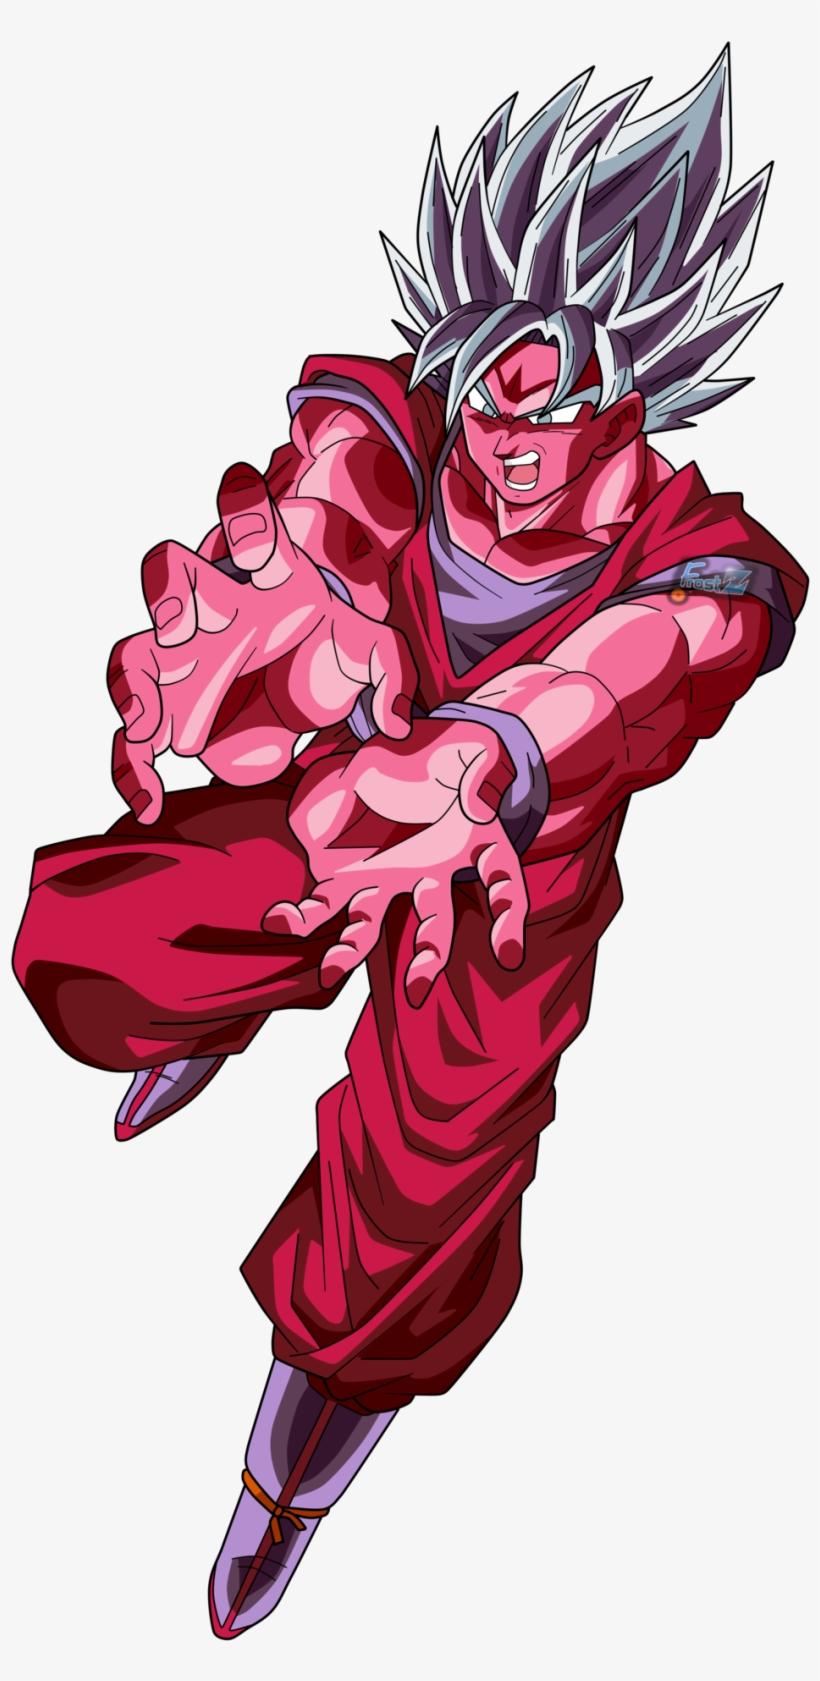 Goku Super Sayian Blue Kaioken Goku Ssj Blue Kaioken X10